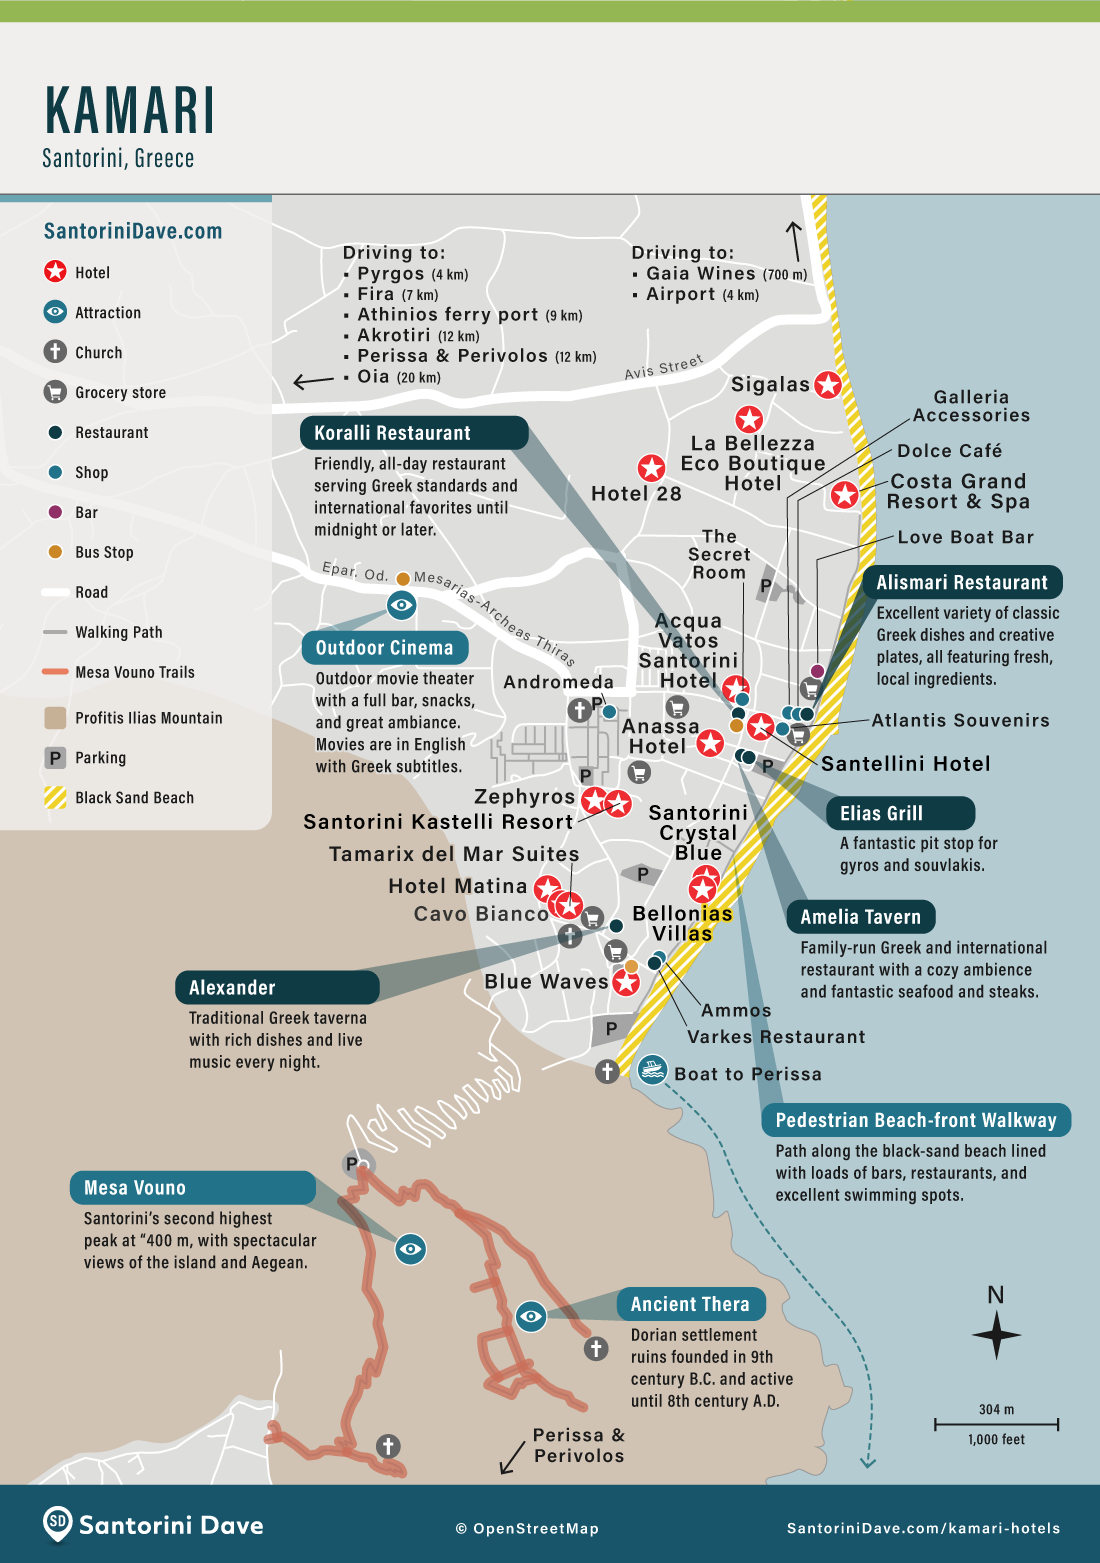 Map of the best Hotels, restaurants, bars, and shops in Kamari, Santorini.